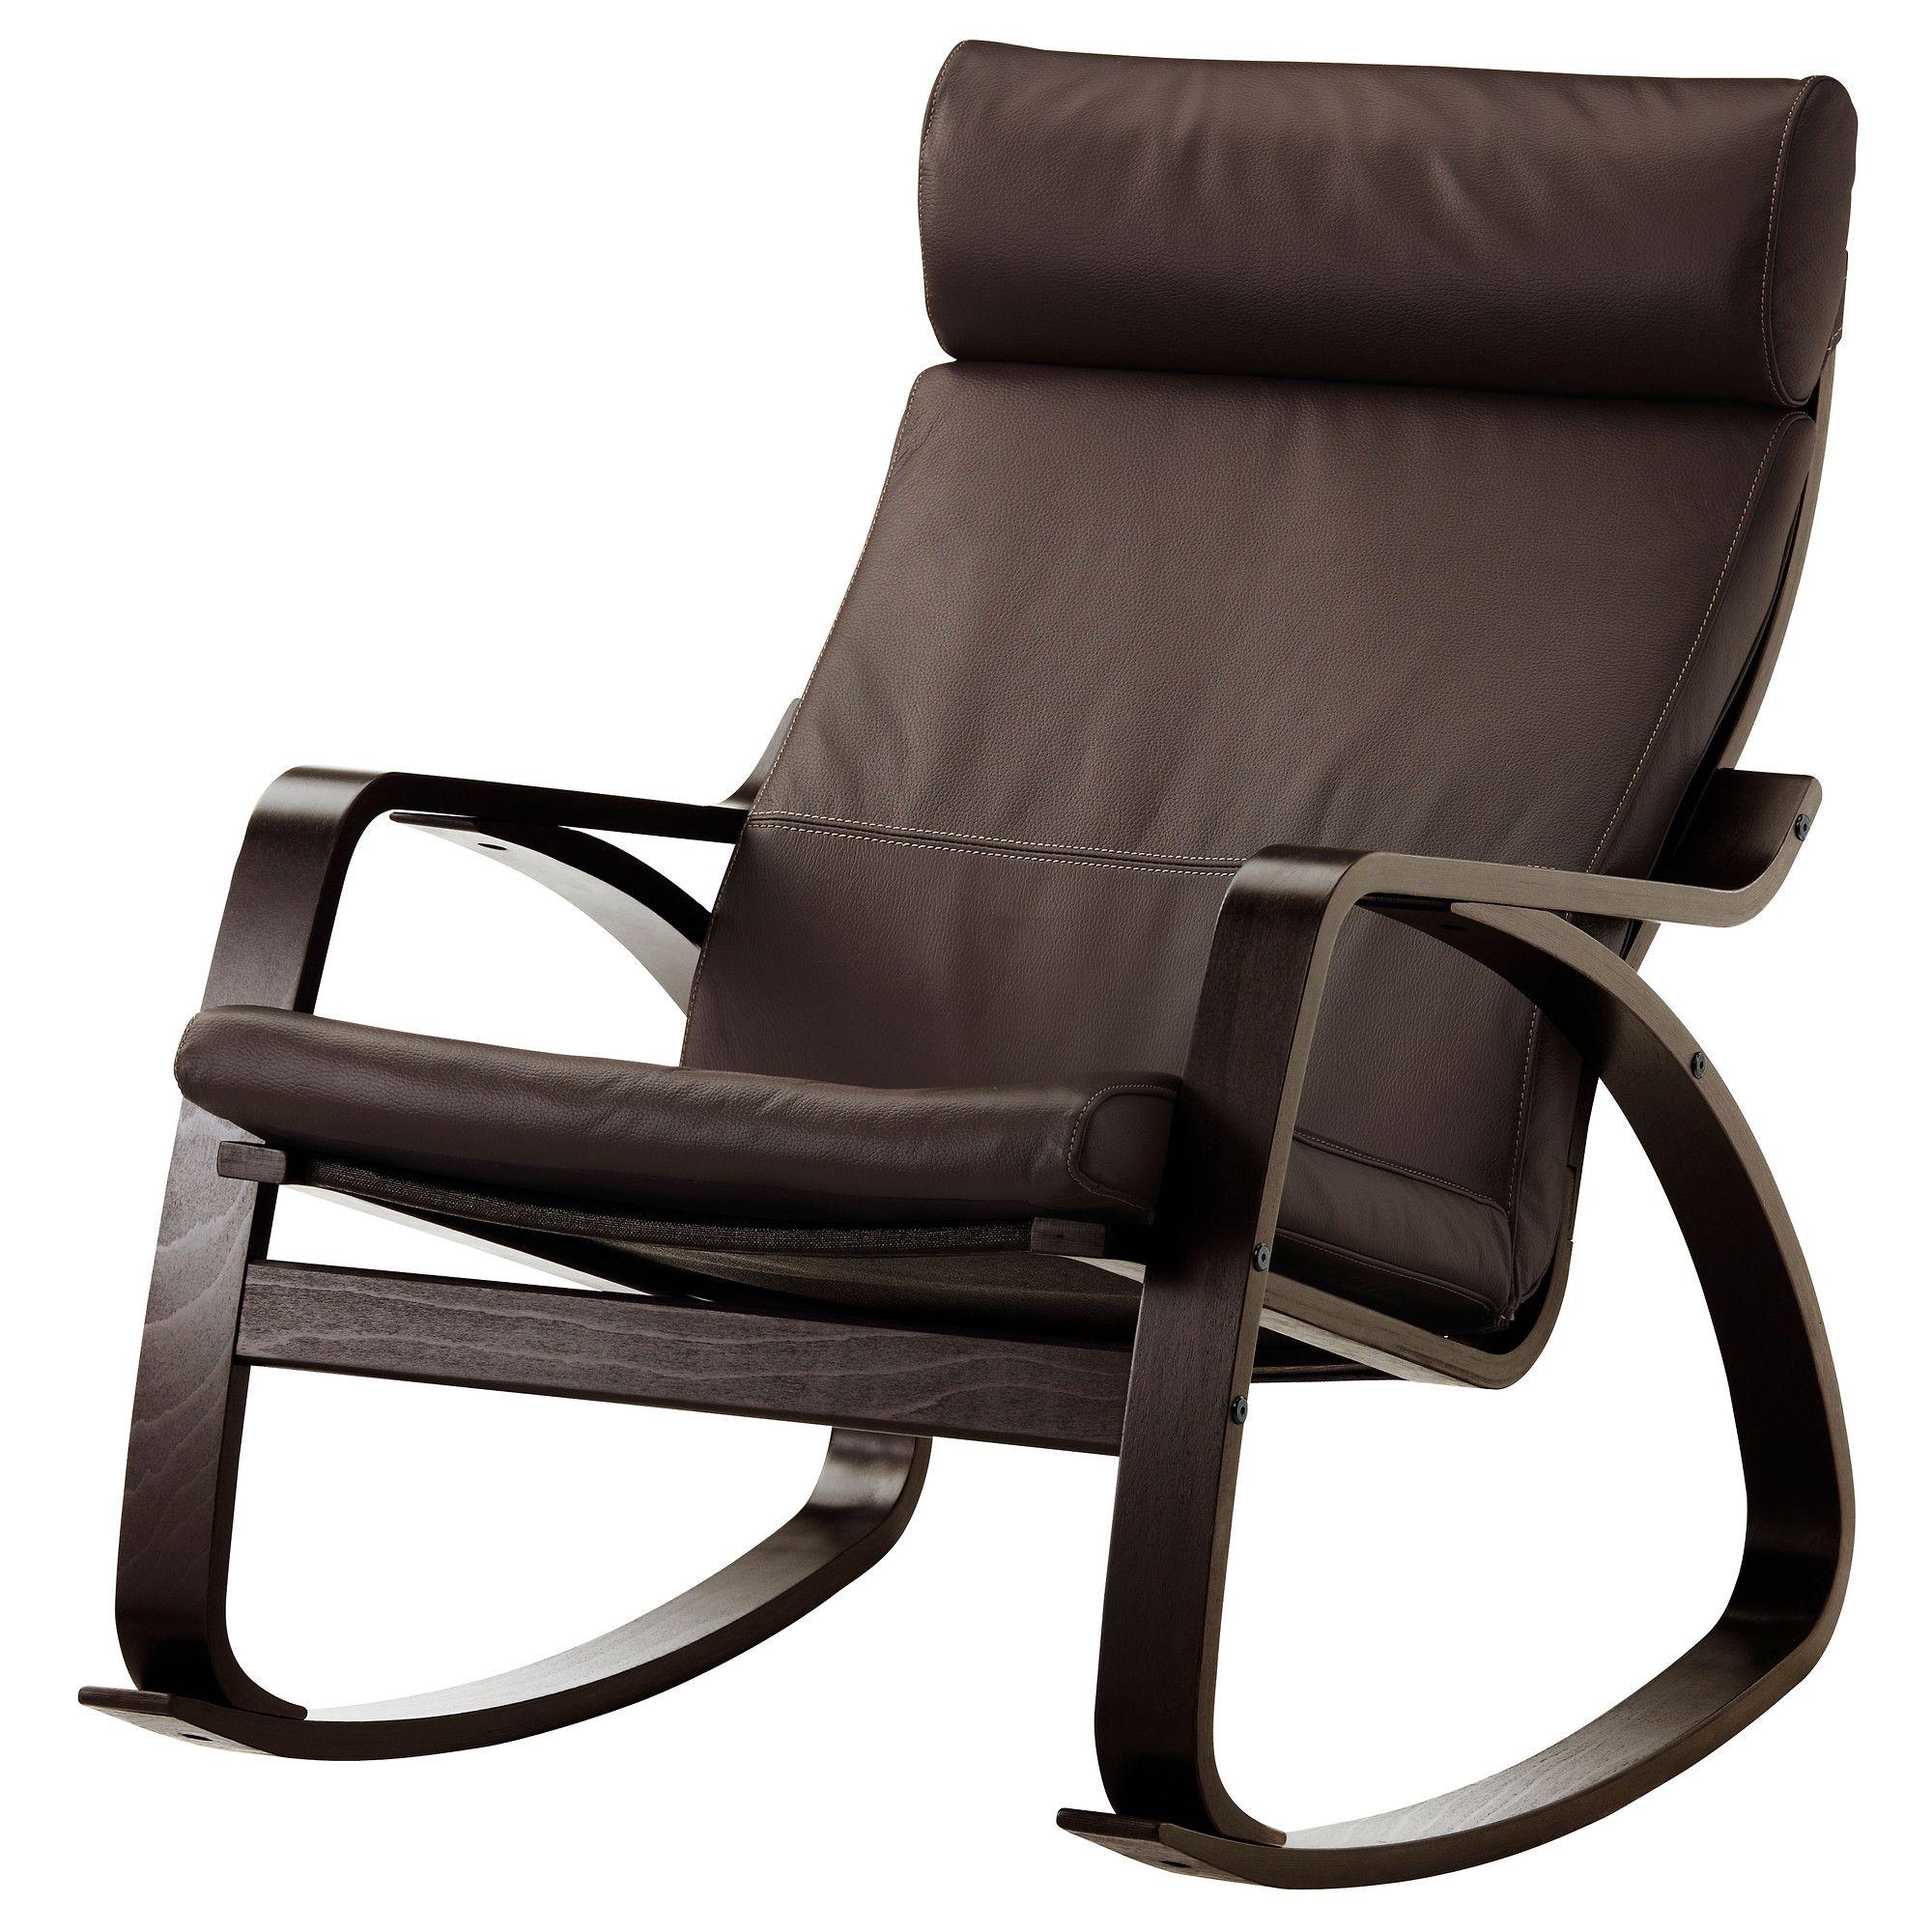 Poang Rocking Chair Black Brown Robust Glose Dark Brown Poang